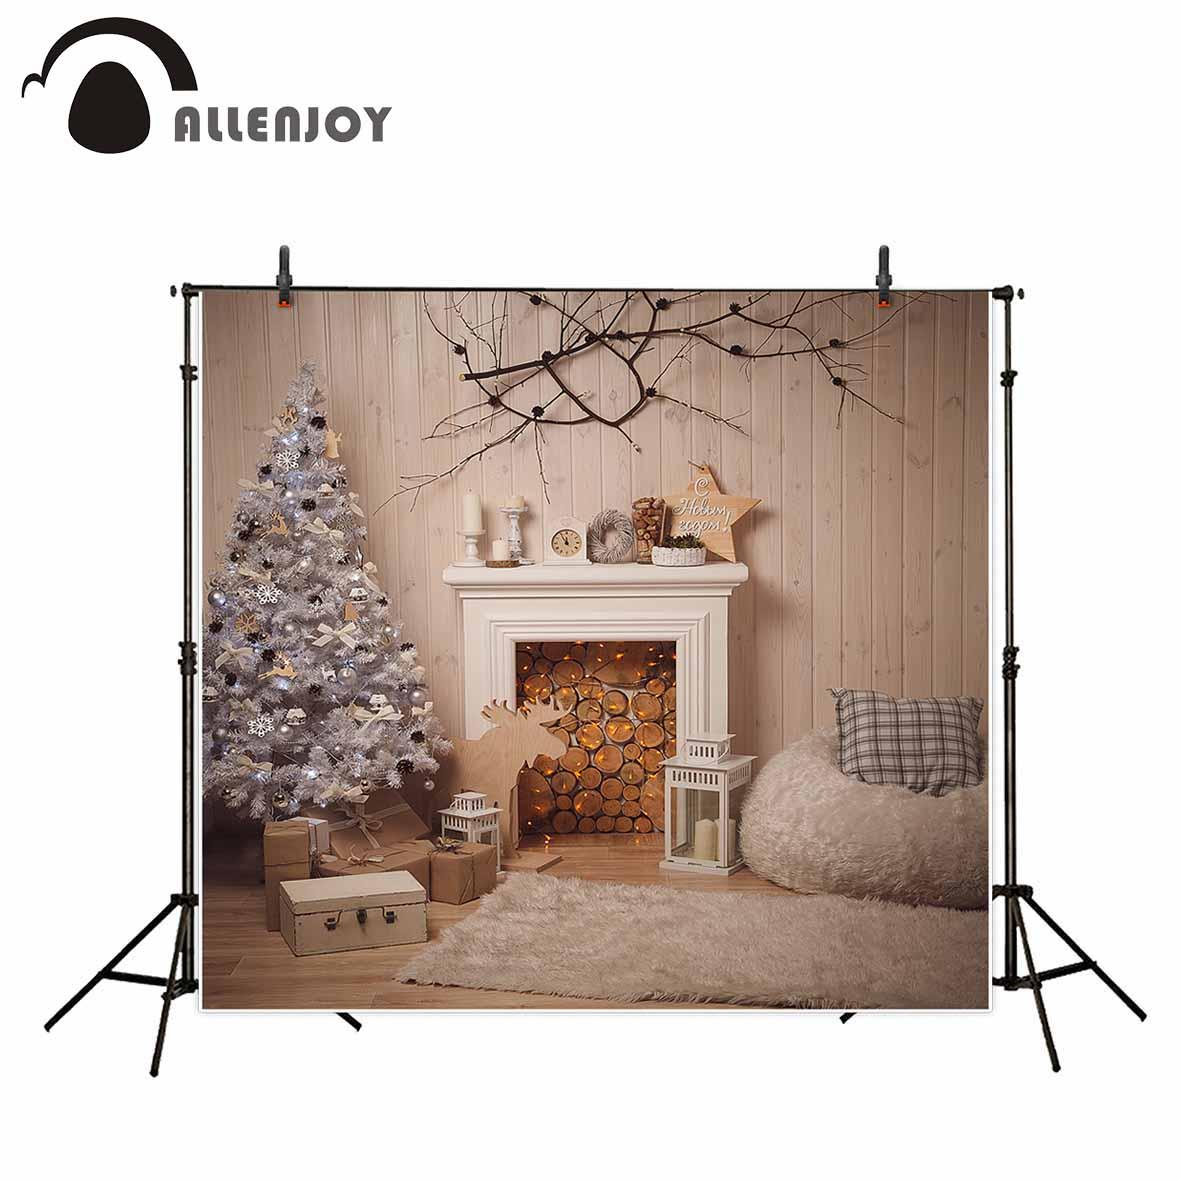 Allenjoy newborn photography background Wooden White Christmas Tree Fireplace Gift Child photo studio photobooth high quality